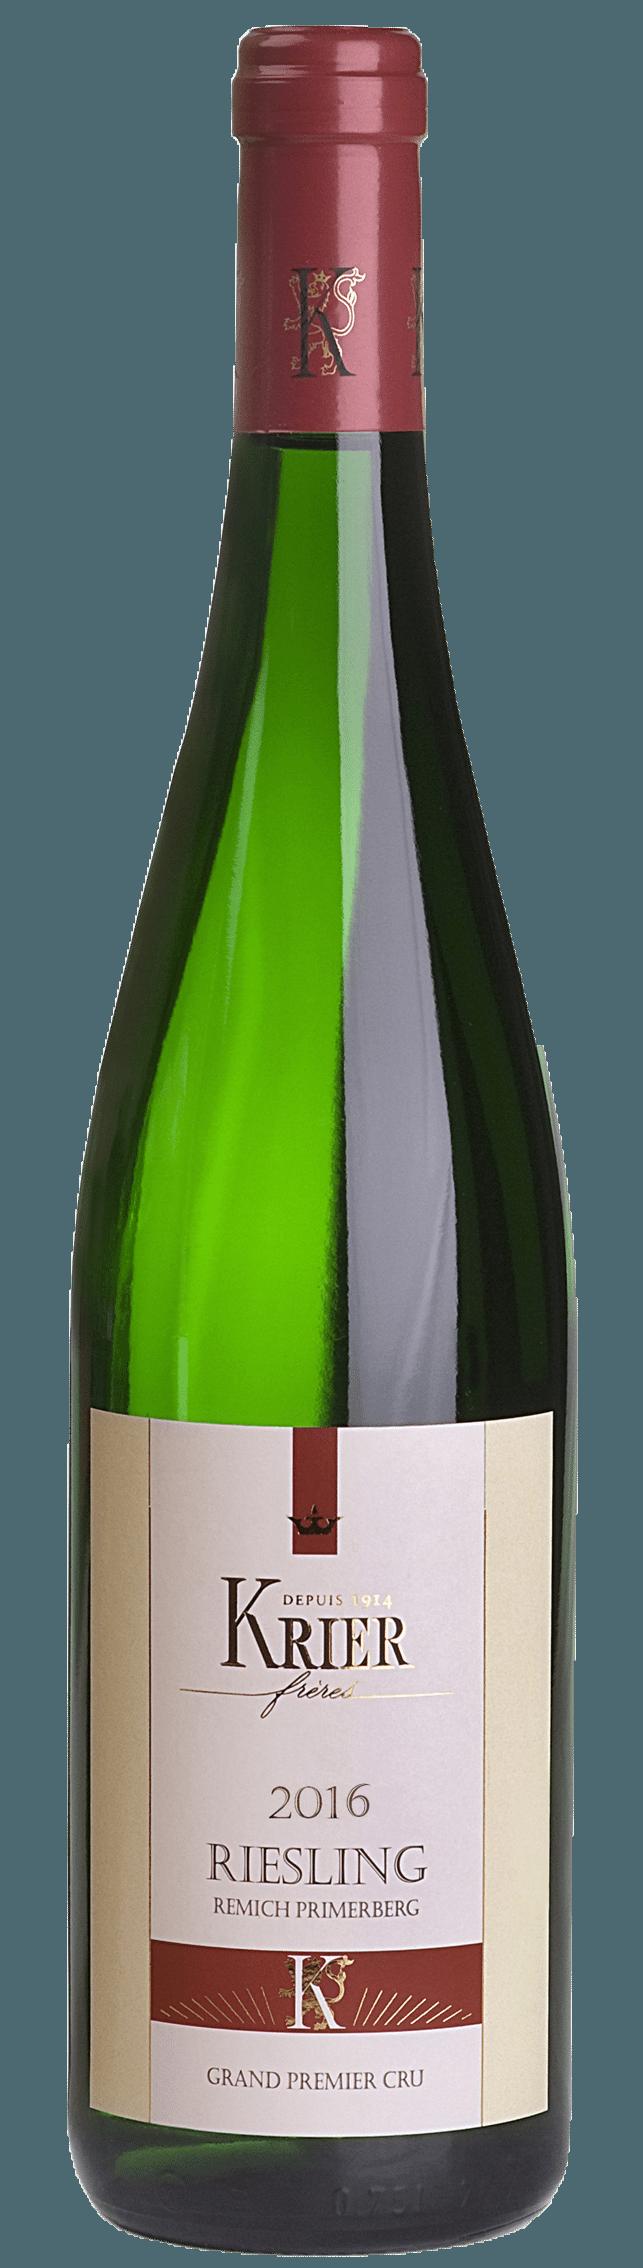 Krier Riesling Grand Premier Cru Remich Primerberg 2016